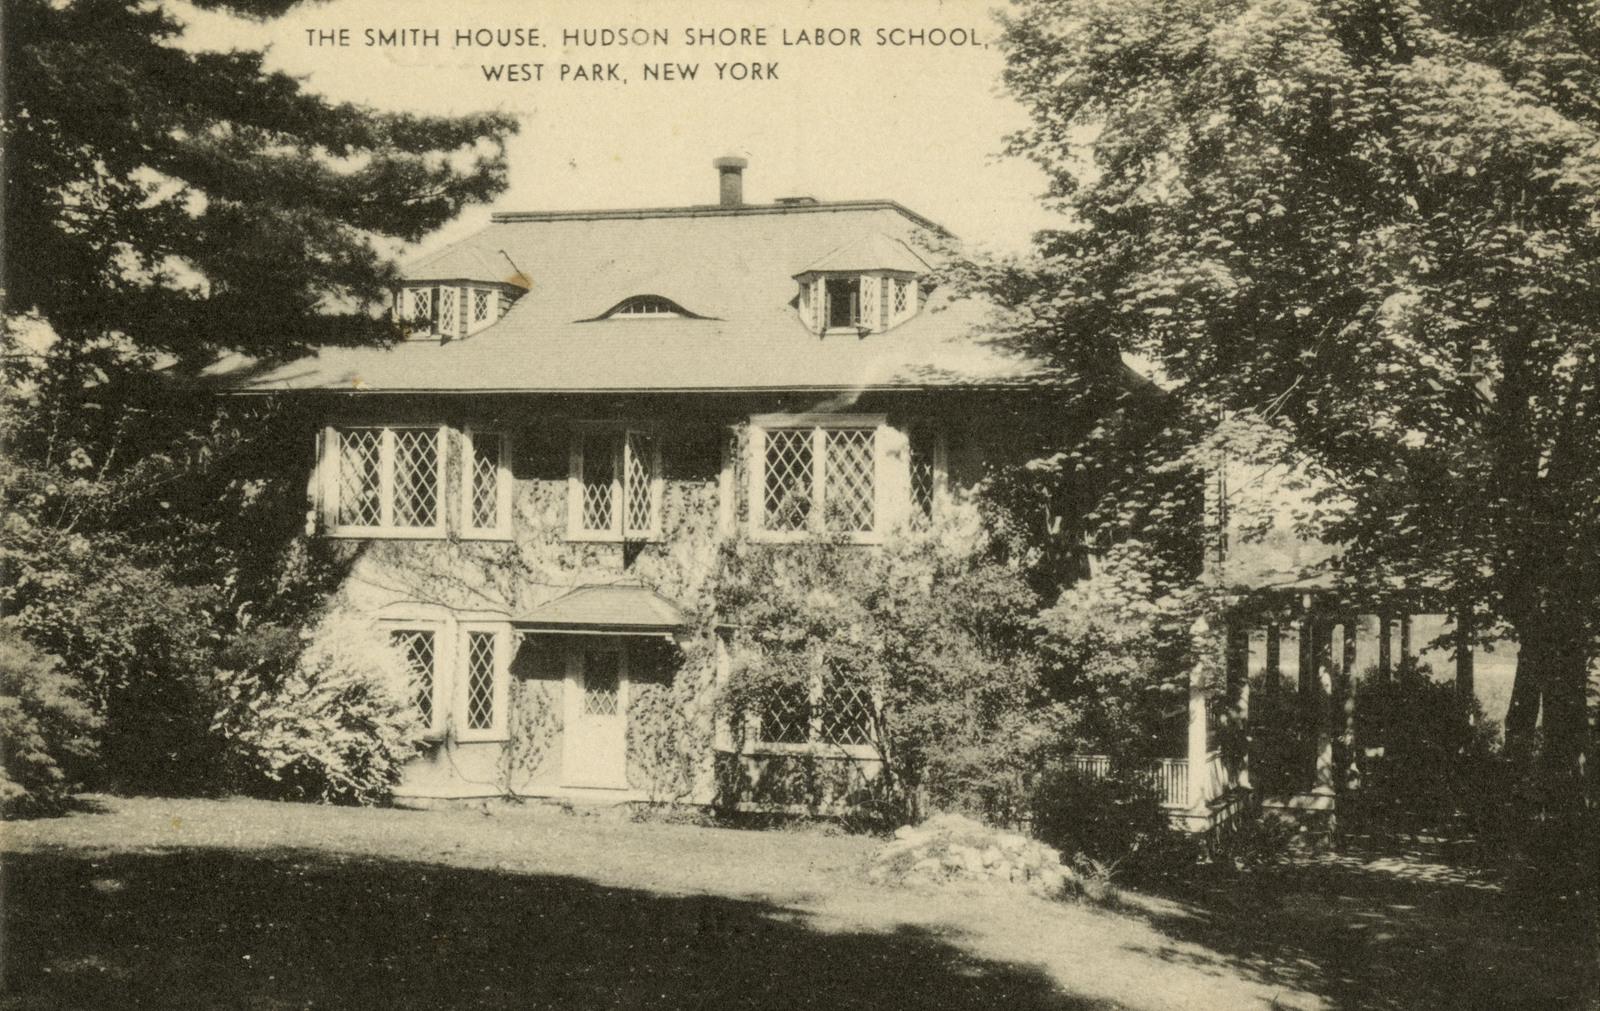 The Smith House (Hudson Shore Labor School)